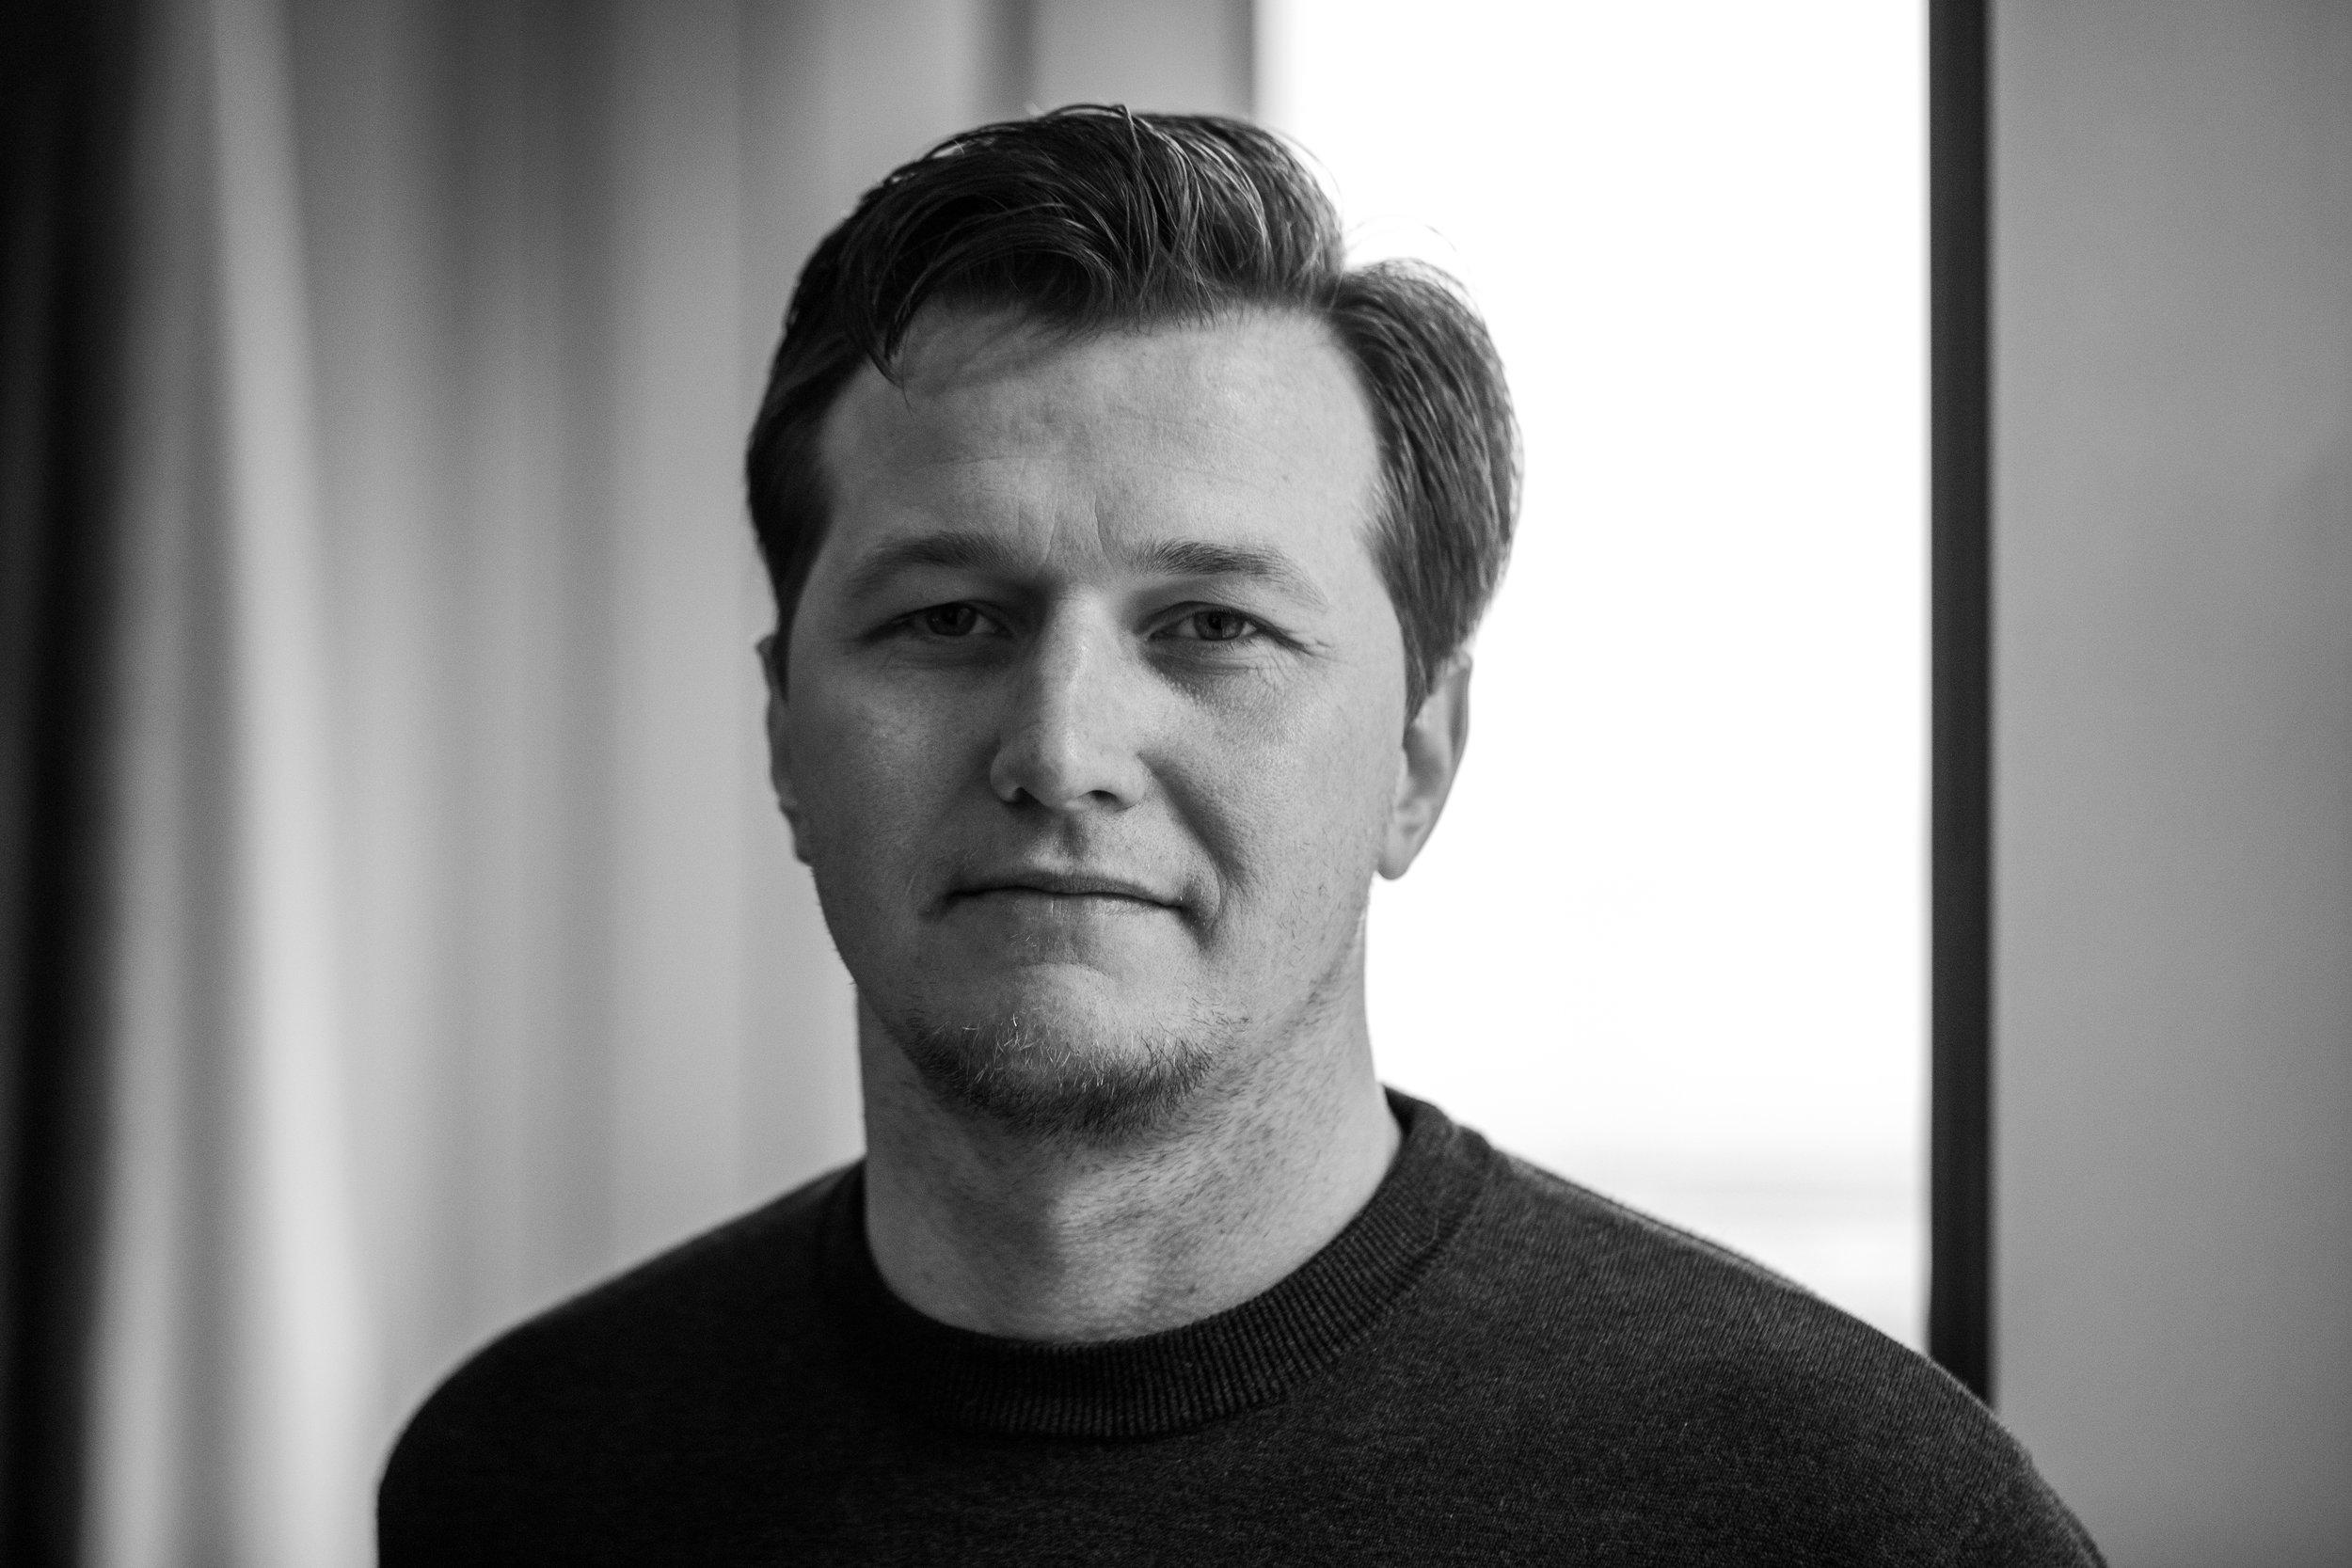 Chris Coldiron - Field Service Engineer, South